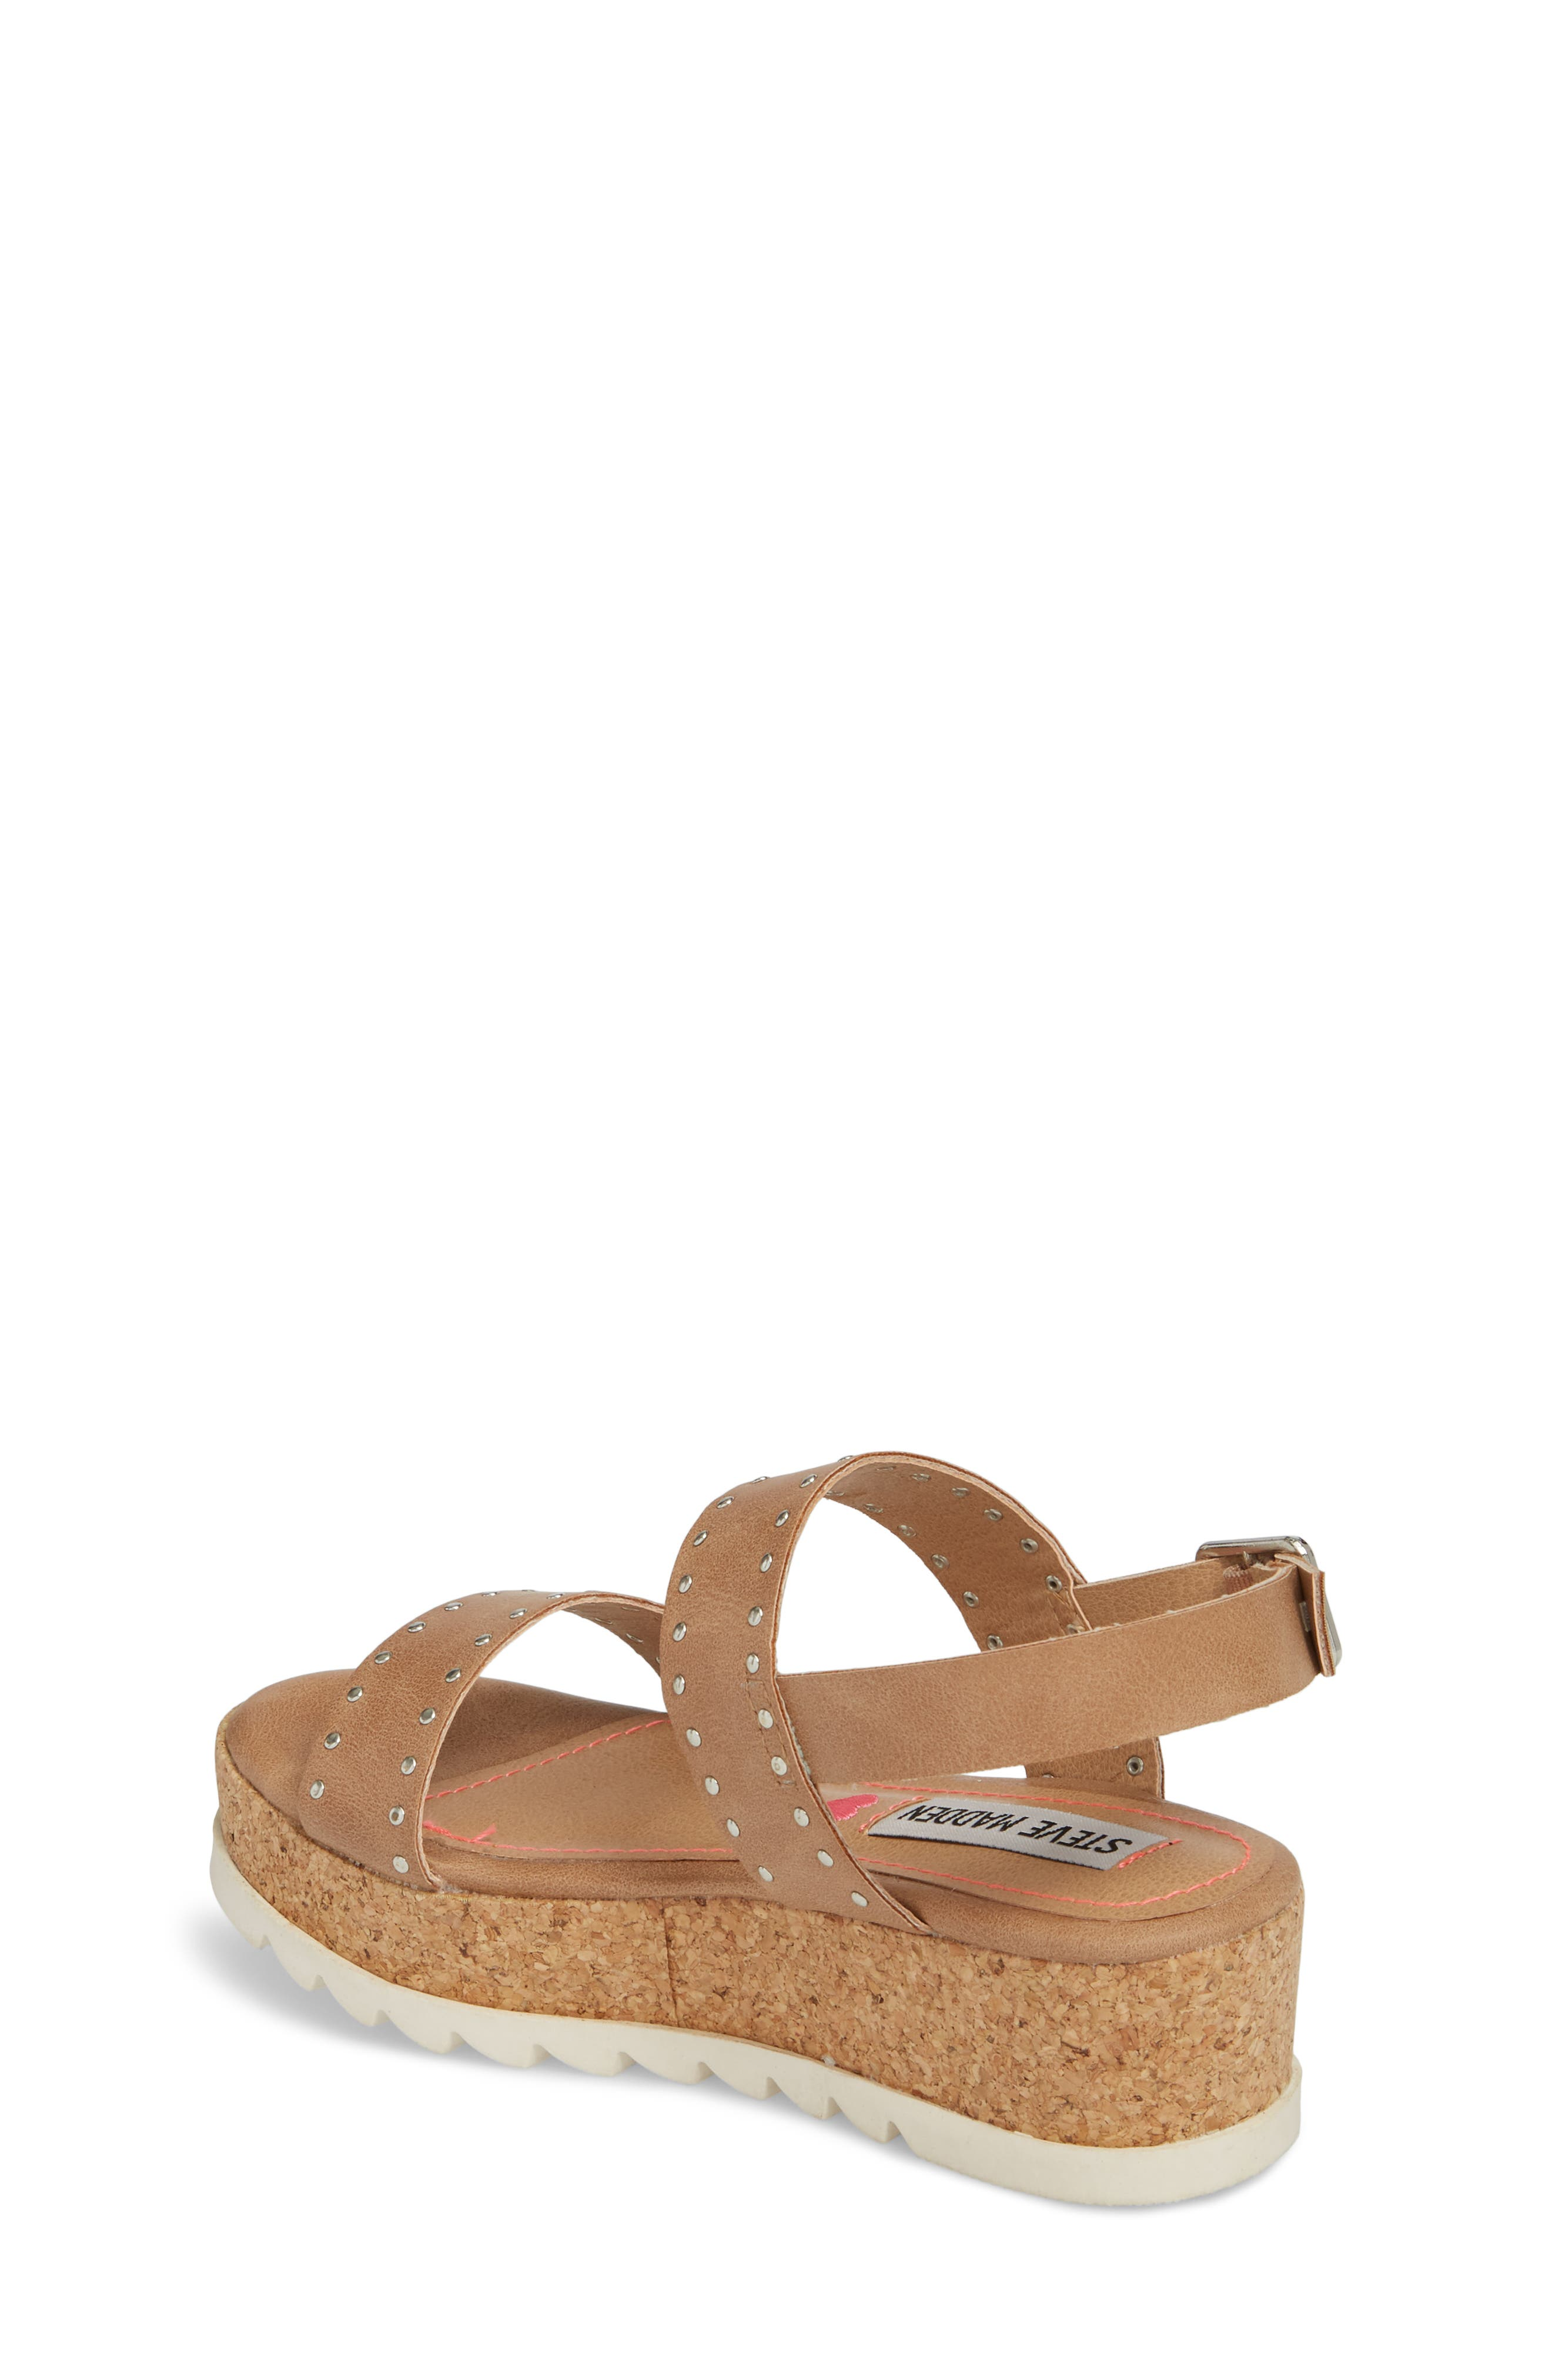 JKRISTIE Platform Sandal,                             Alternate thumbnail 2, color,                             Natural